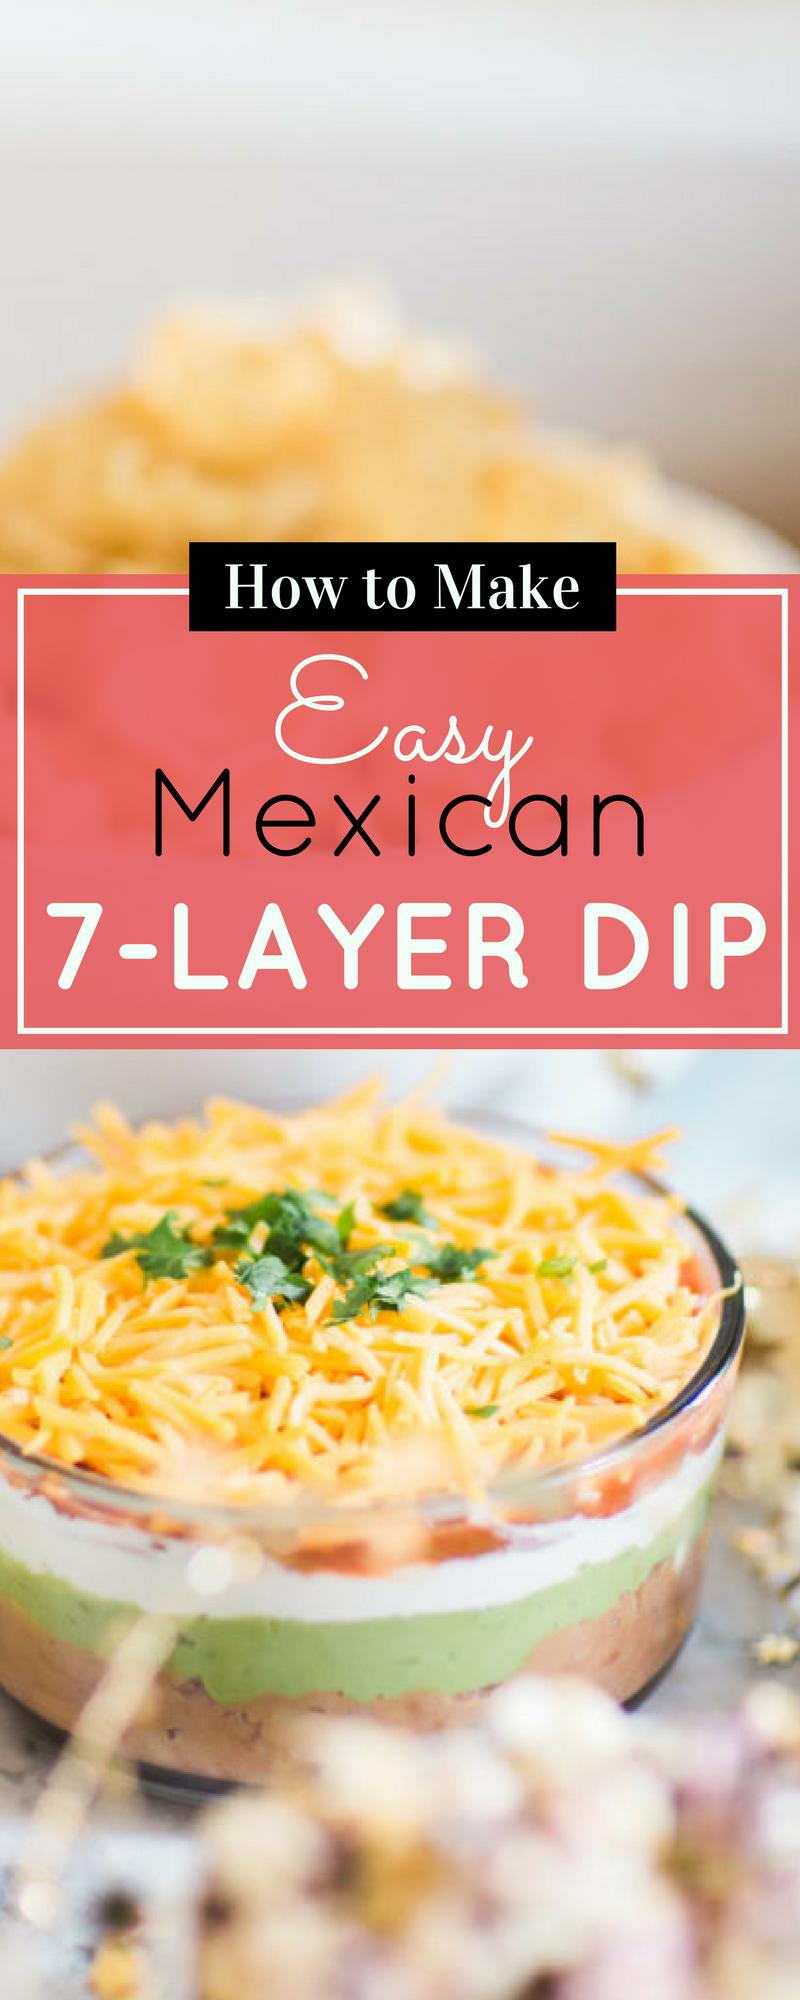 A quick and easy recipe for the BEST Mexican 7-layer dip. | glitterinc.com | @glitterinc